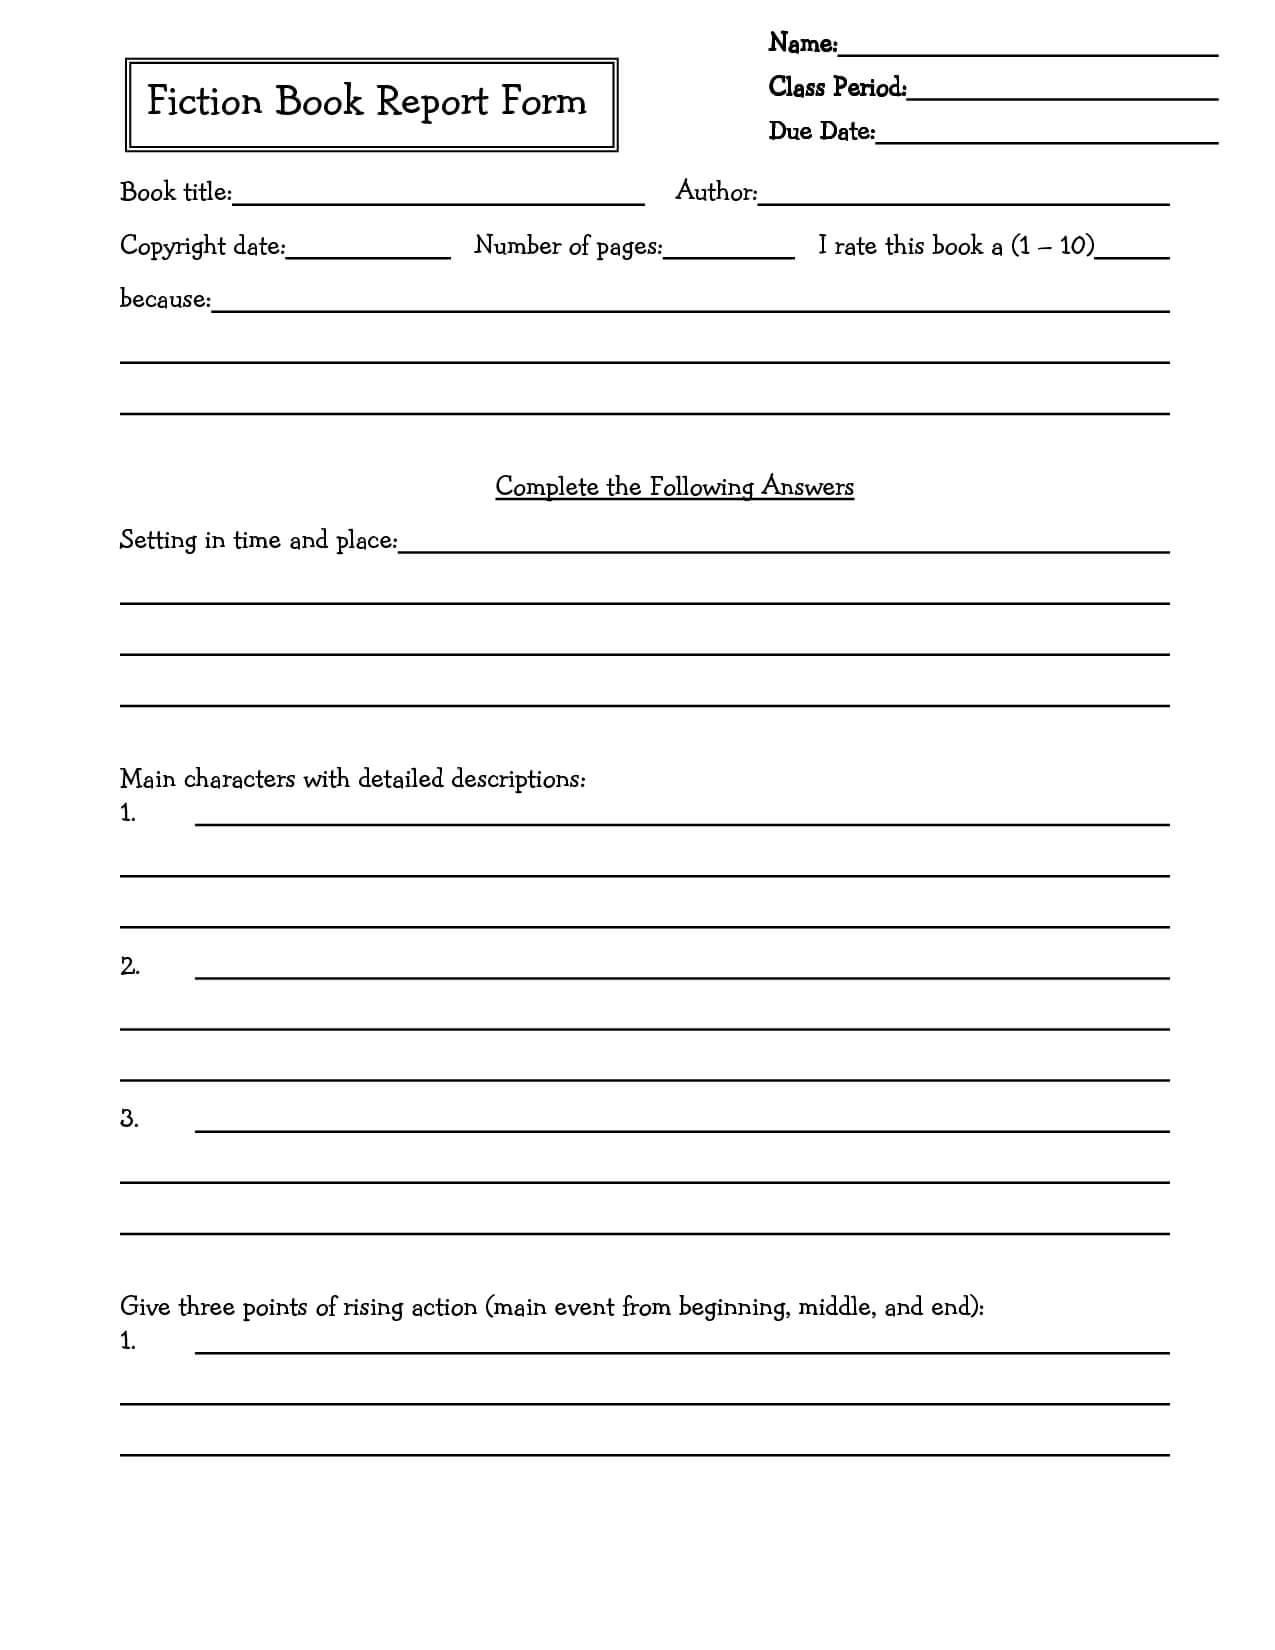 Middle School Book Report Brochure. 6Th Grade | 7Th Grade With Regard To Book Report Template Middle School